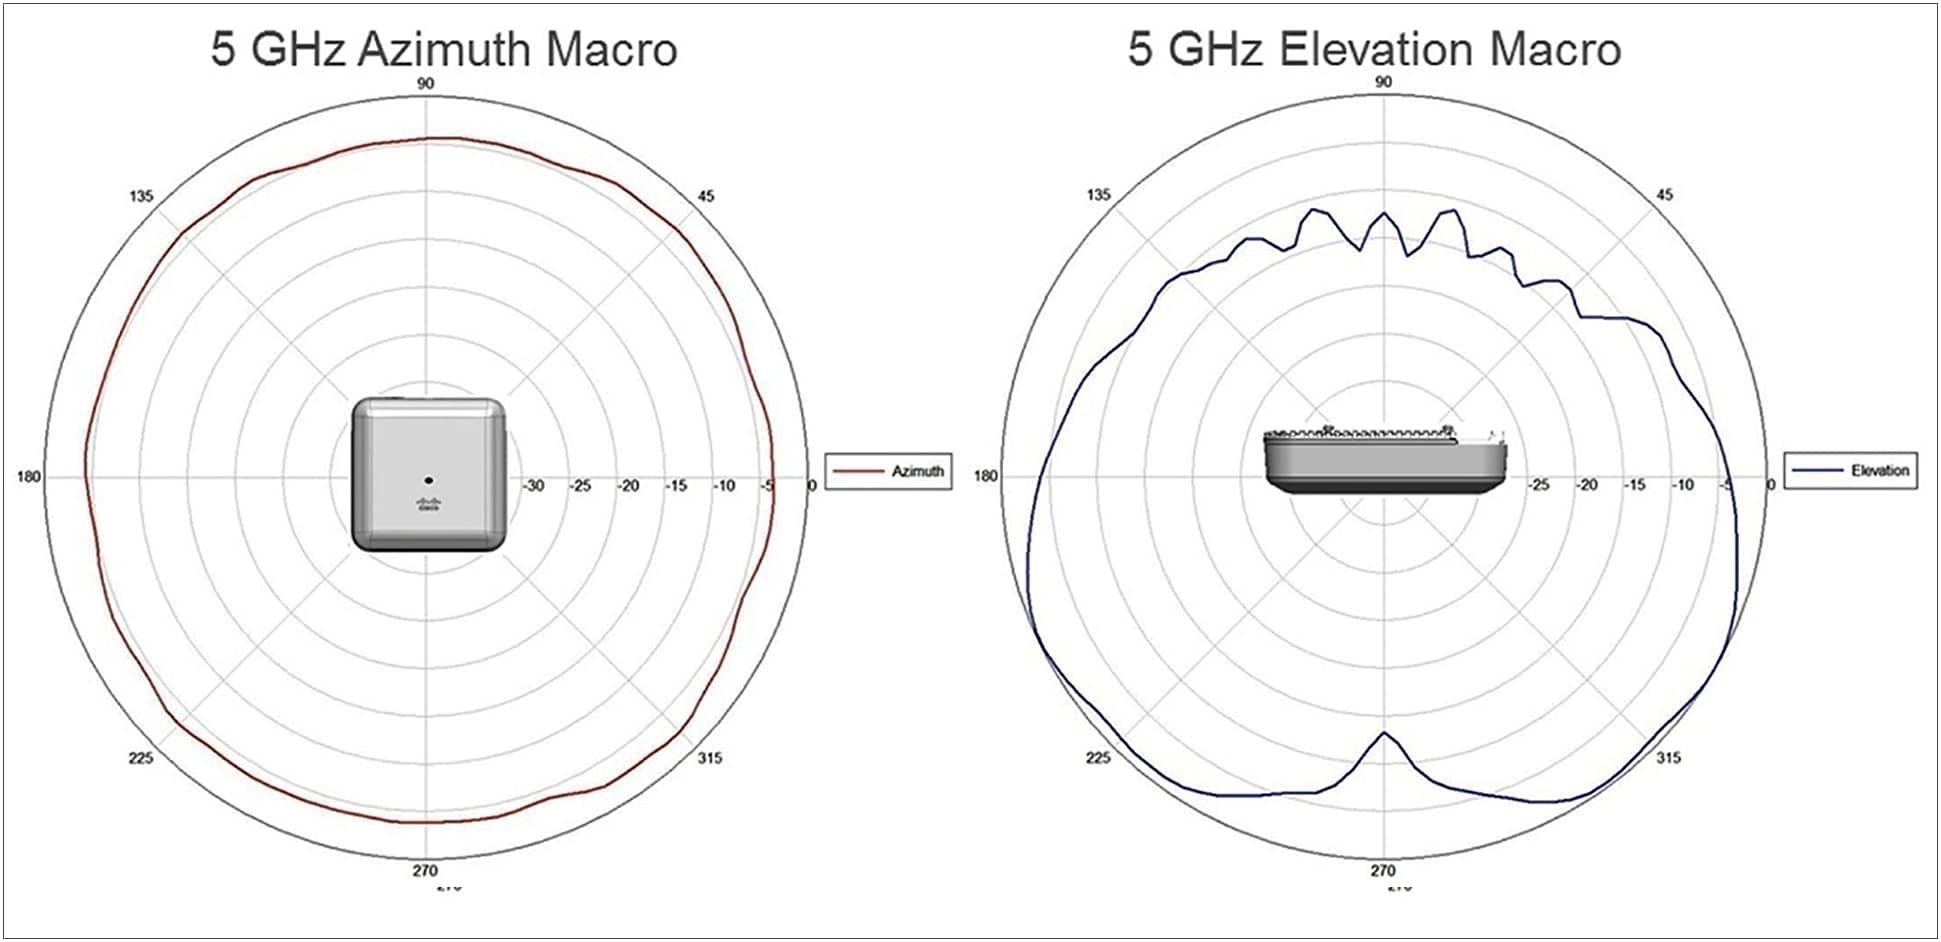 5 GHz Azimuth Macro